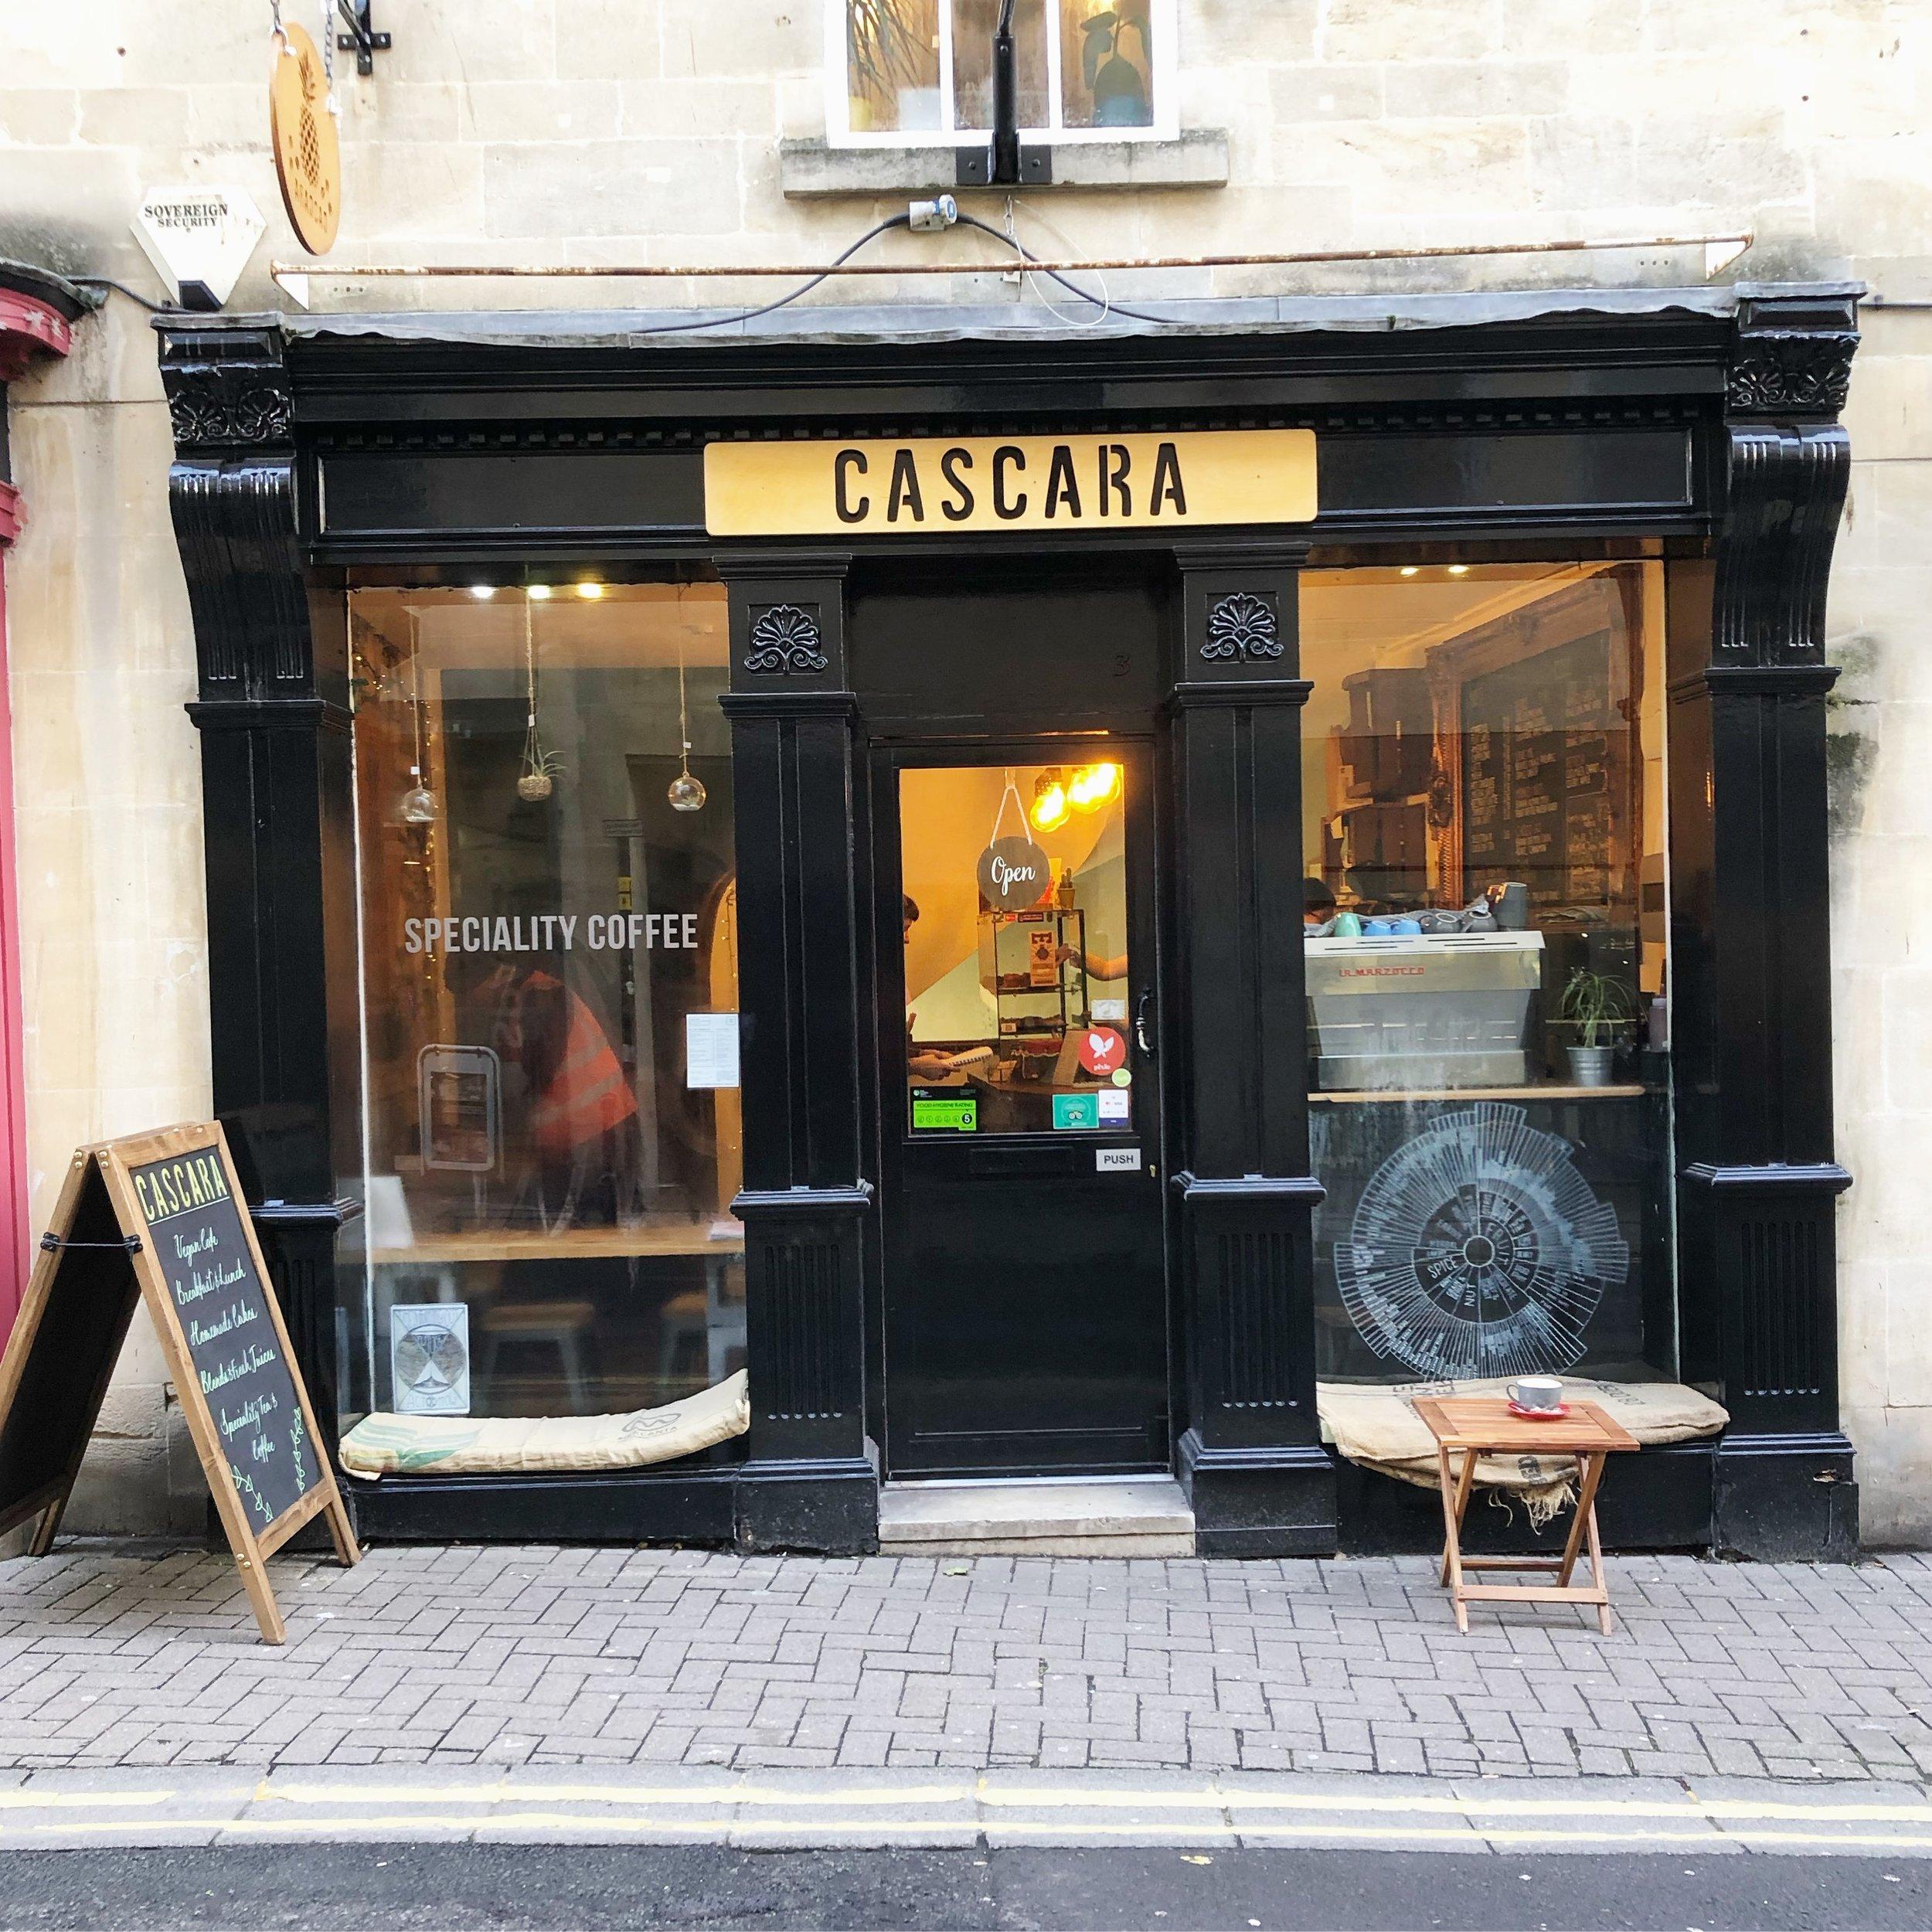 vegan restaurant bath vegan restaurants bath cascara cafe vegetarian plant based cakes coffee